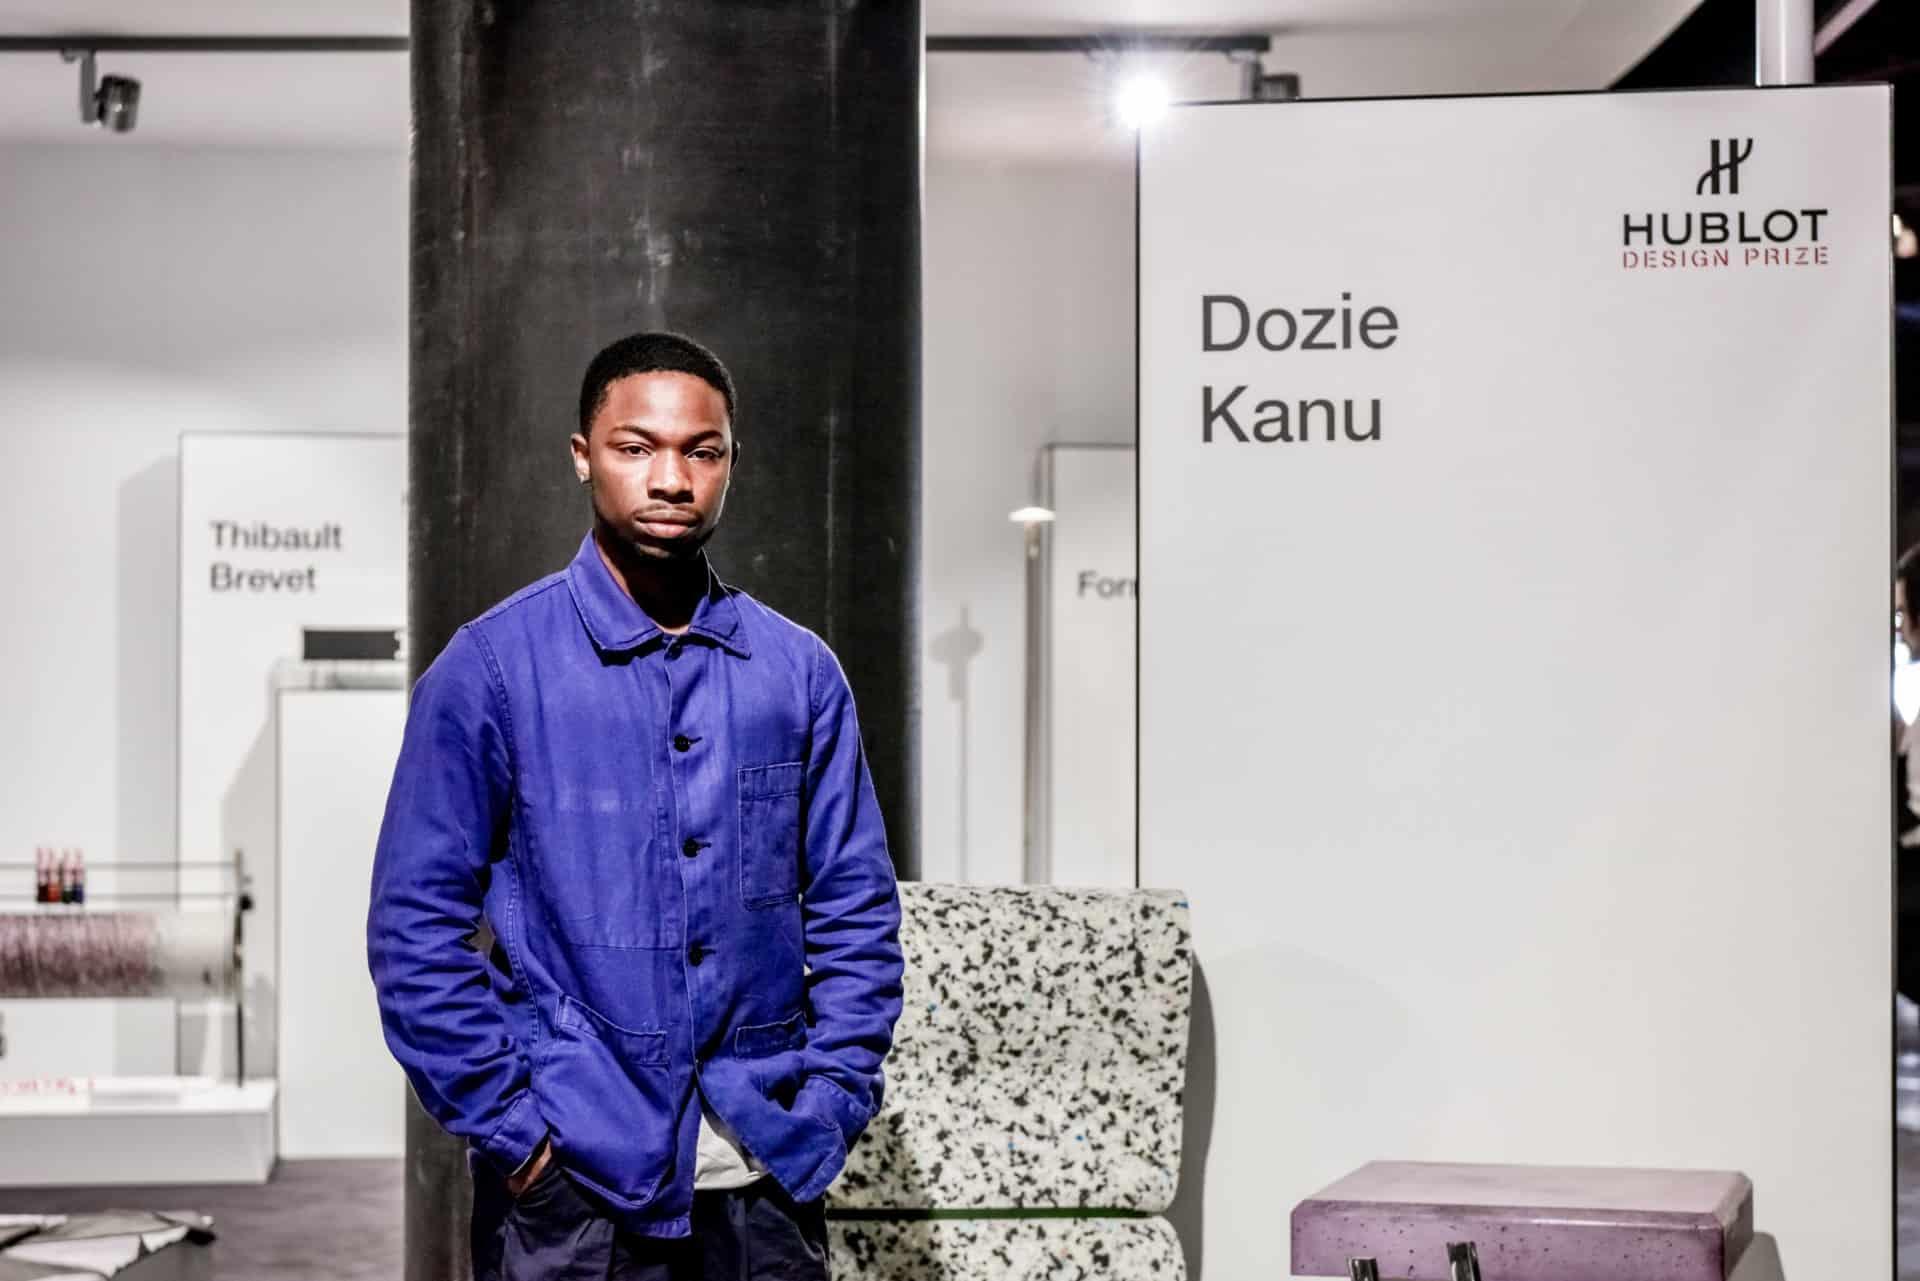 Gewinner des Hublot Design Prize 2018 Dozie Kanu